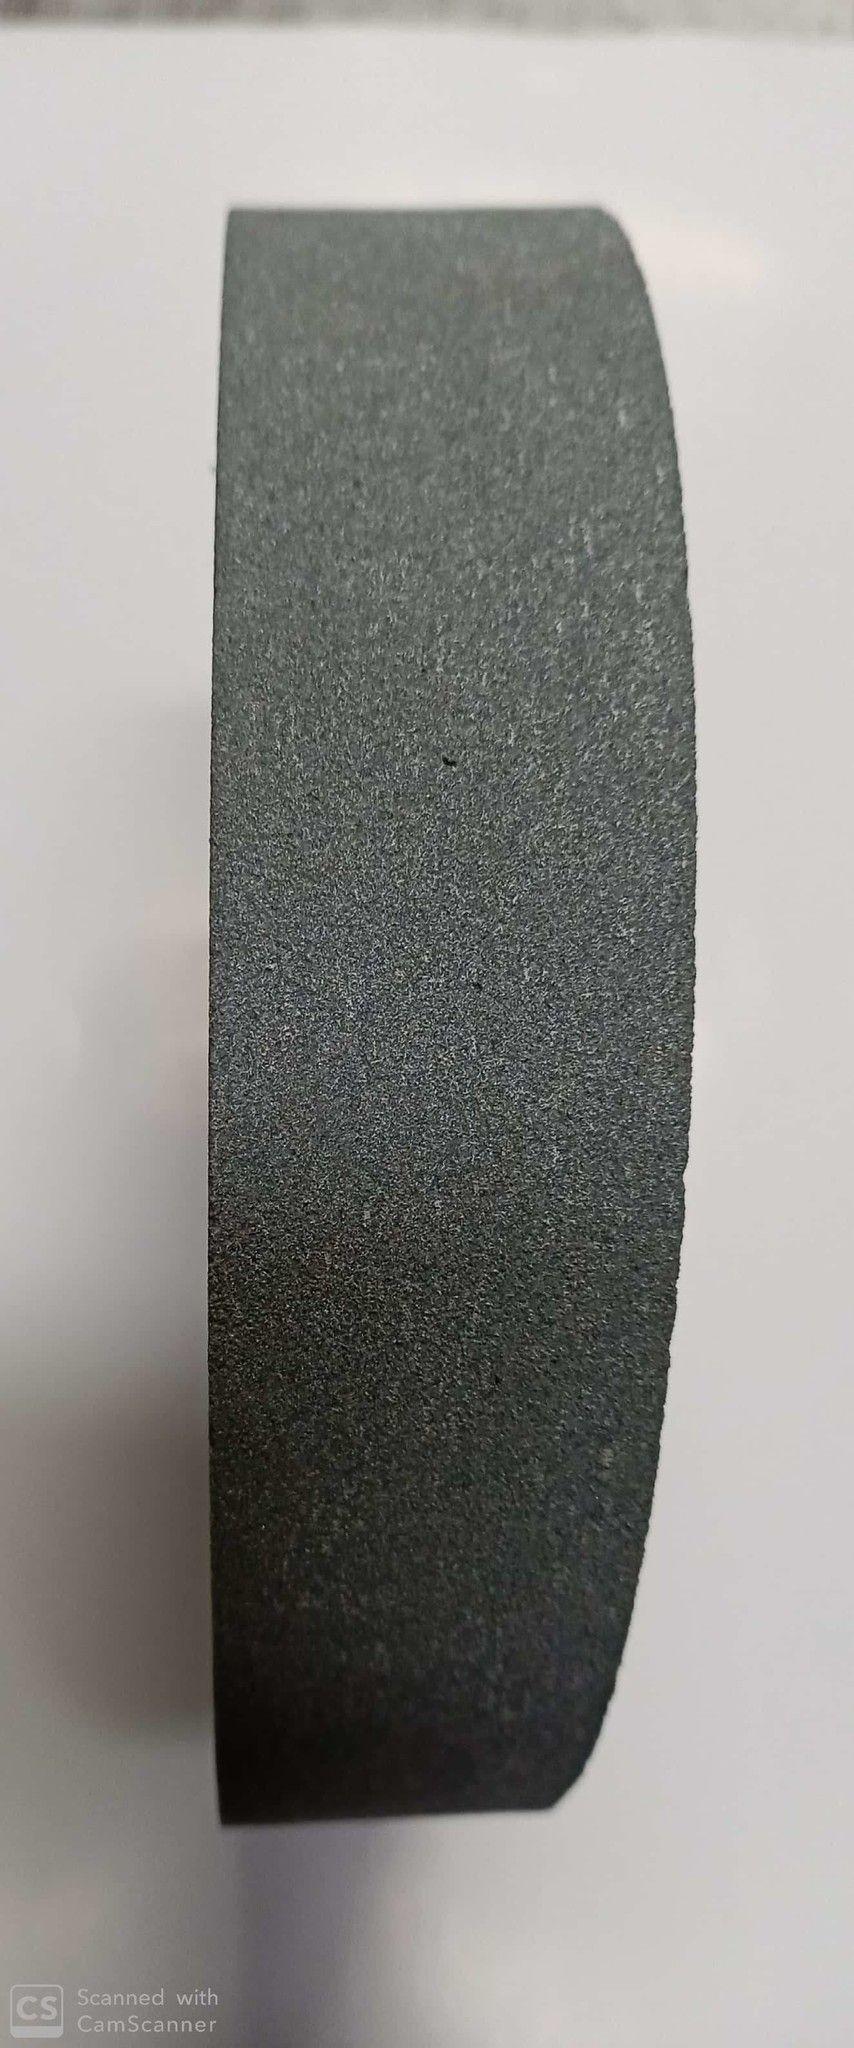 Mola abrasiva ad acqua ø 200x40 foro 20 mm gr 100